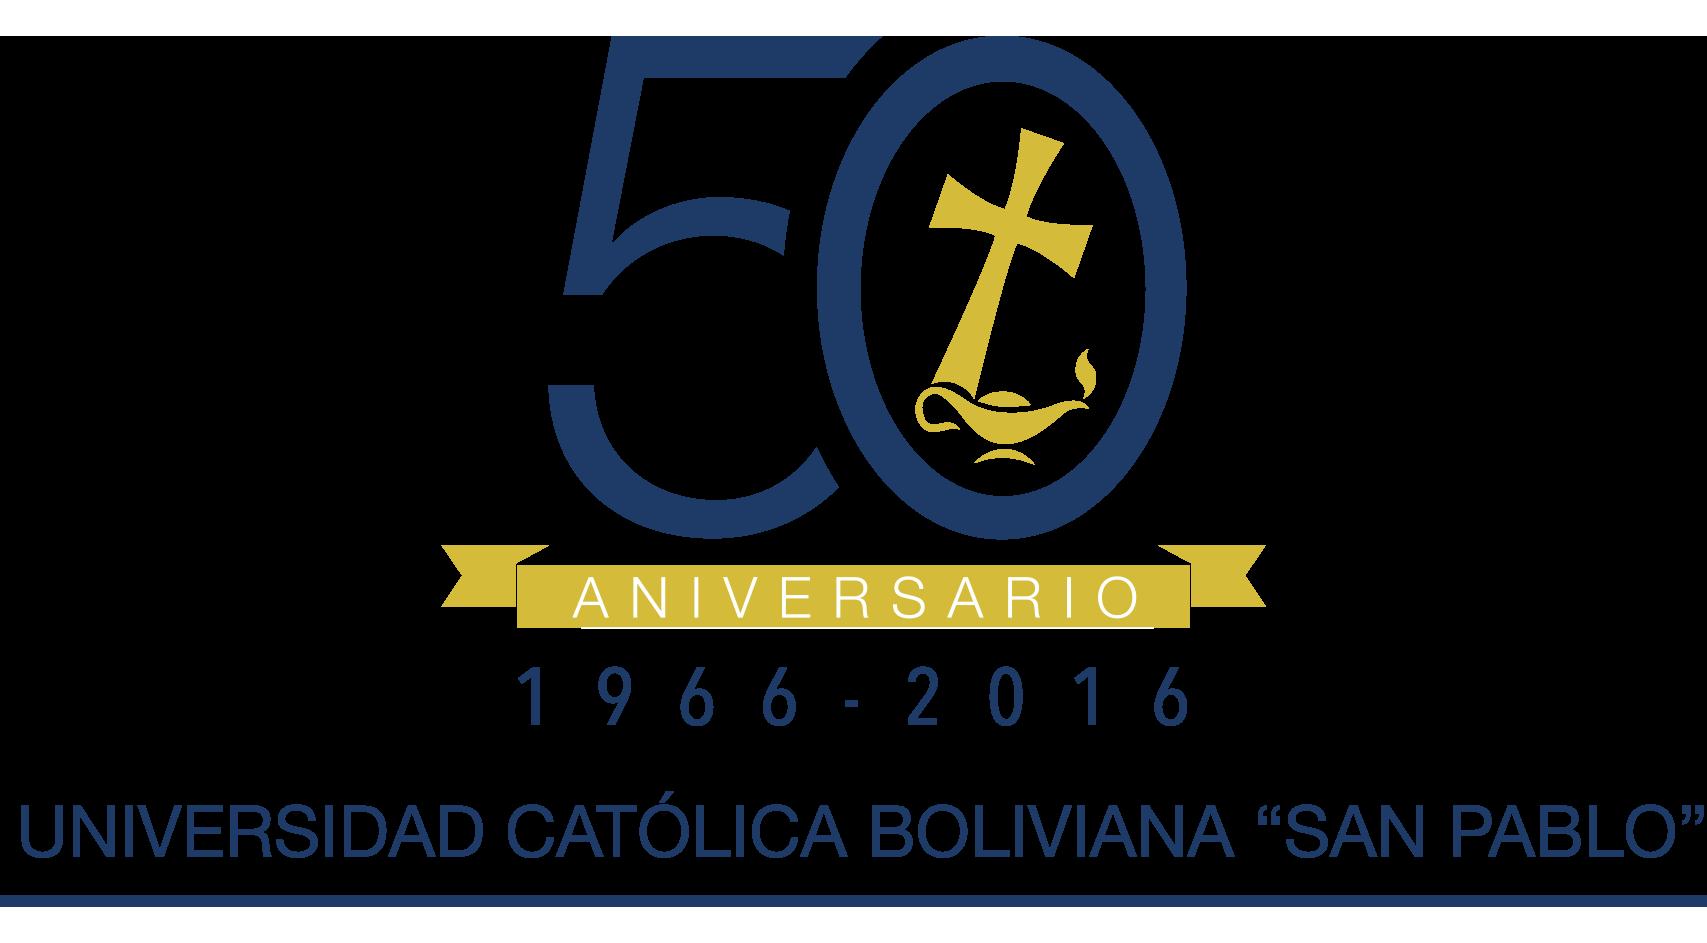 Universidad Catolica Boliviana San Pablo - ePC